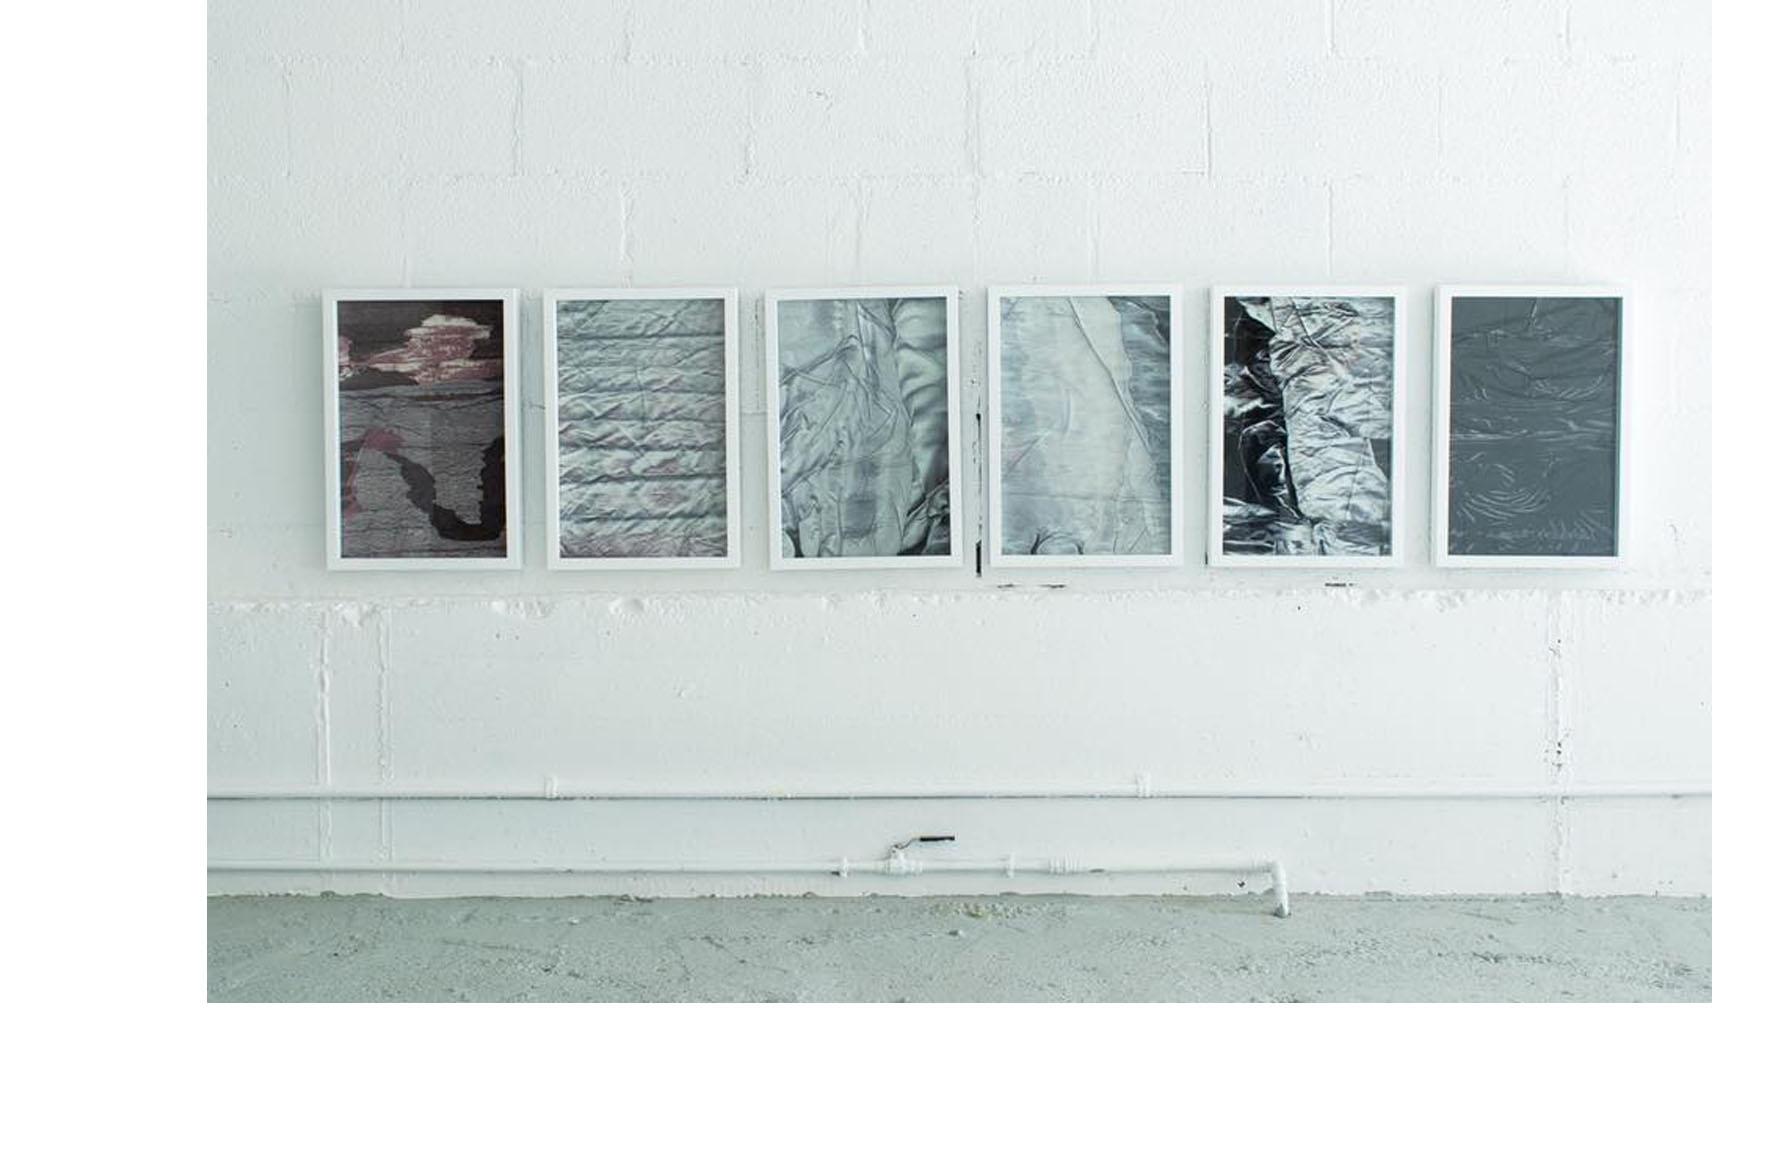 Art Gallery Aldama-Fabré No2-Bilbao-Image 01-Scratch the surface.jpg